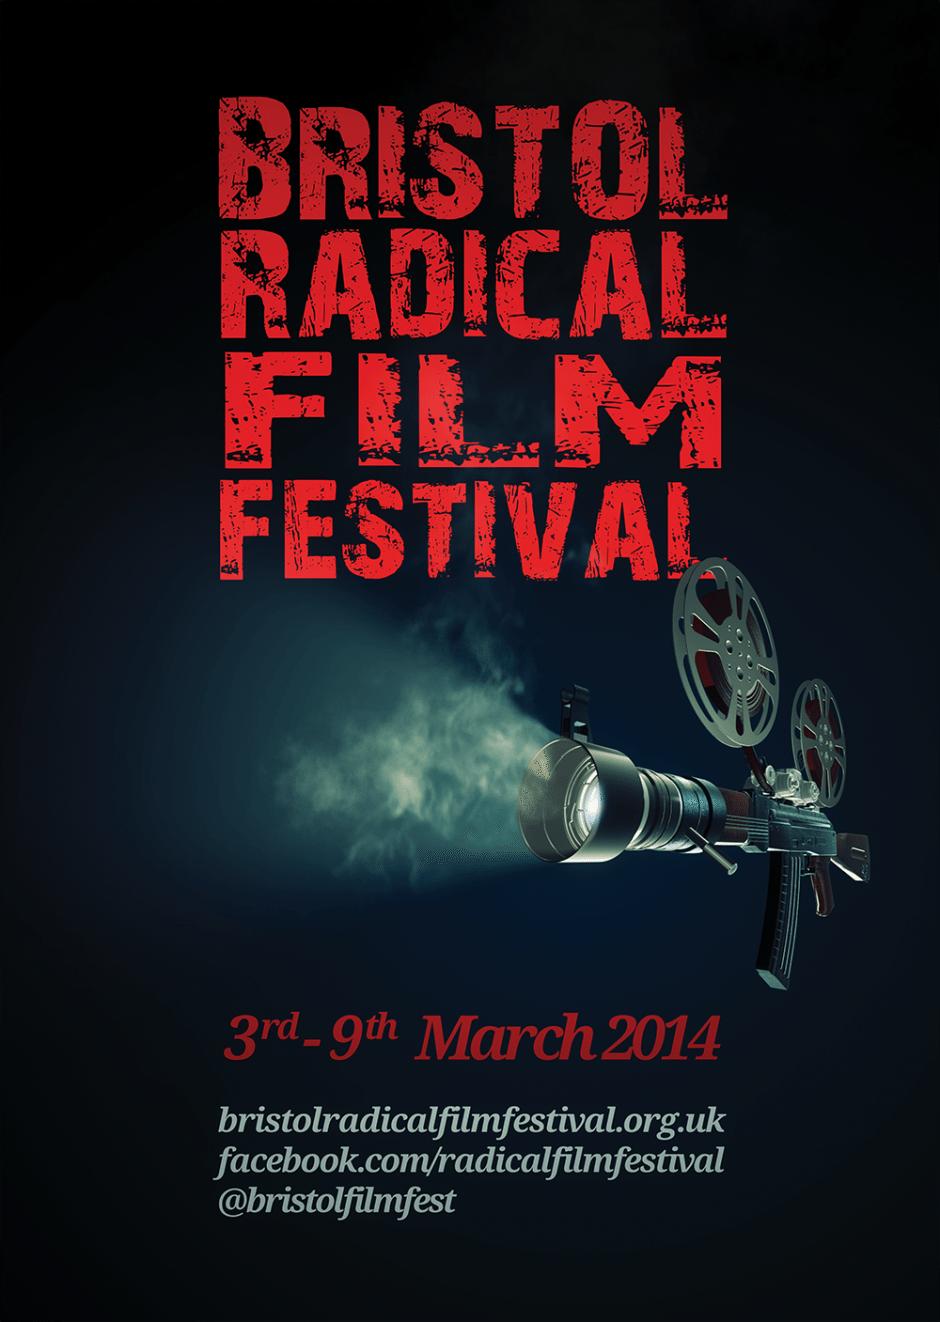 Bristol-Radical-Film-Festival-2014